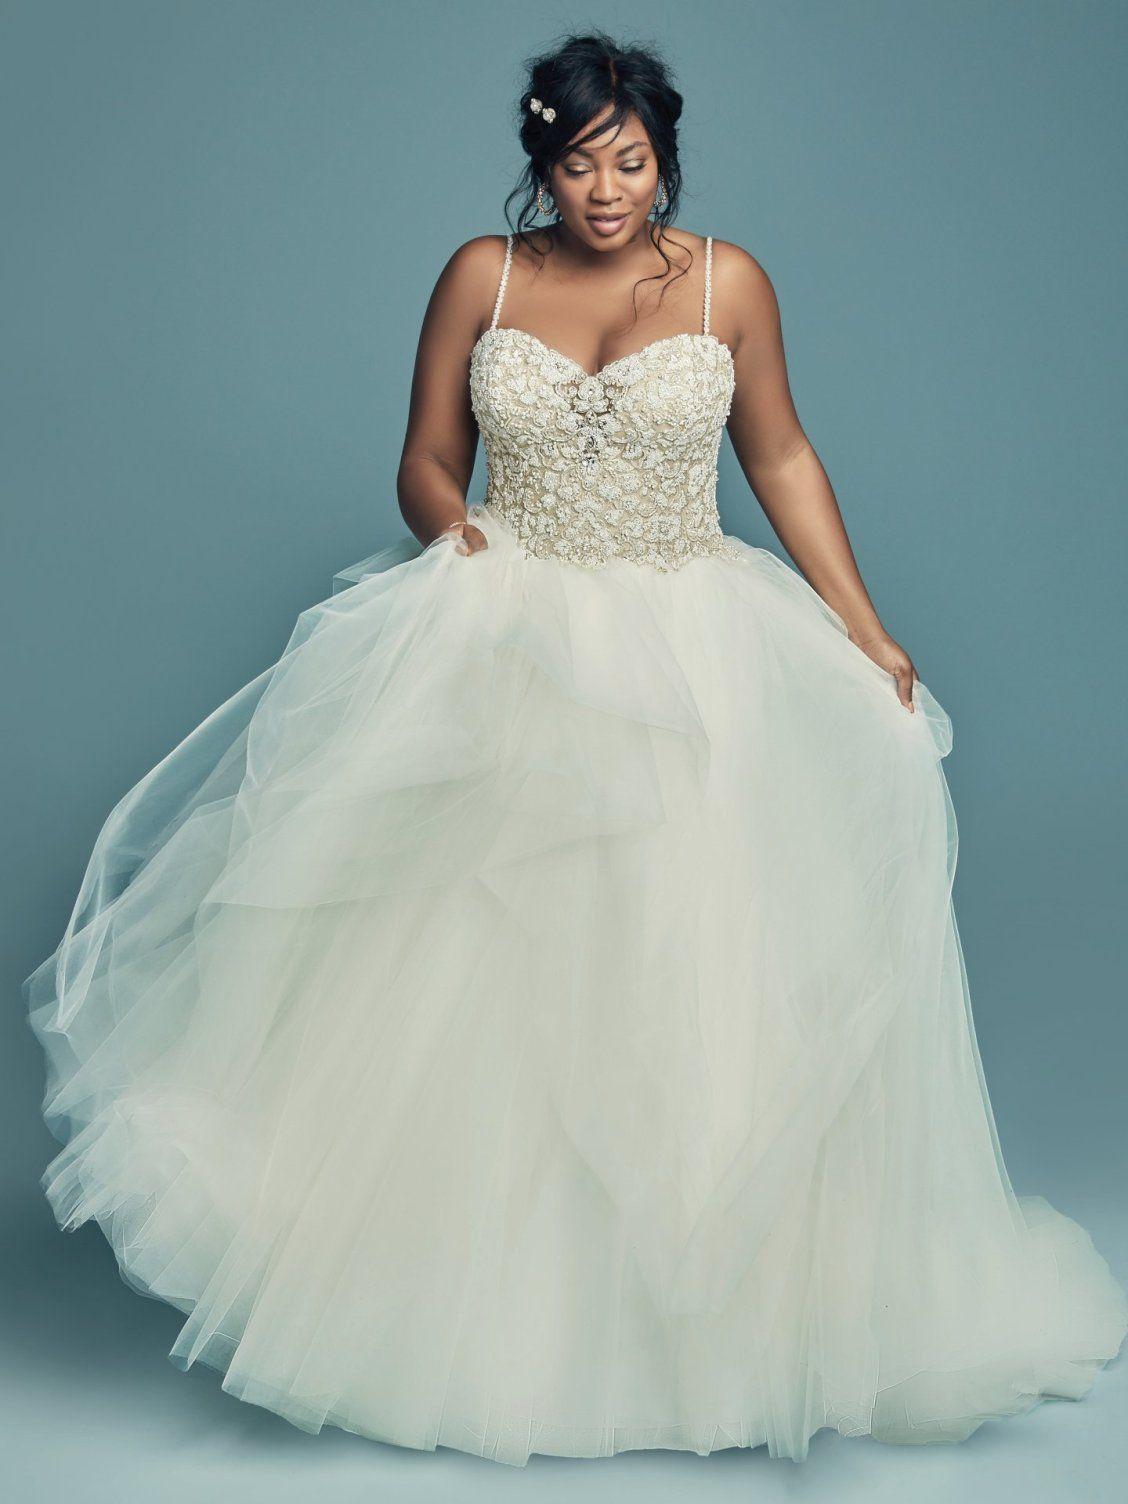 Maggie Sottero Wedding Dresses | Maggie sottero, Princess wedding ...